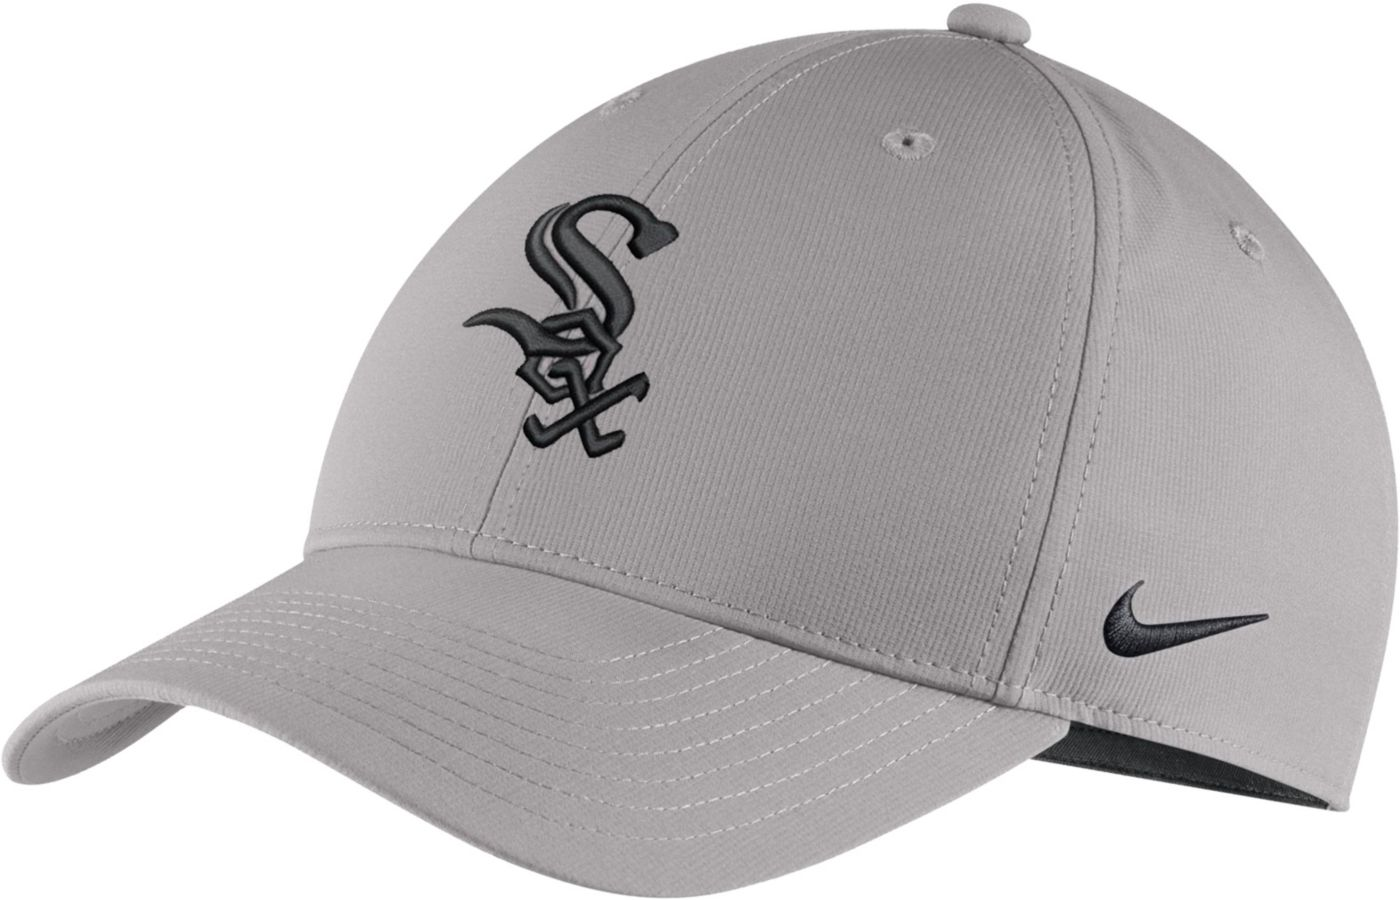 Nike Men's Chicago White Sox Dri-FIT Legacy 91 Adjustable Hat